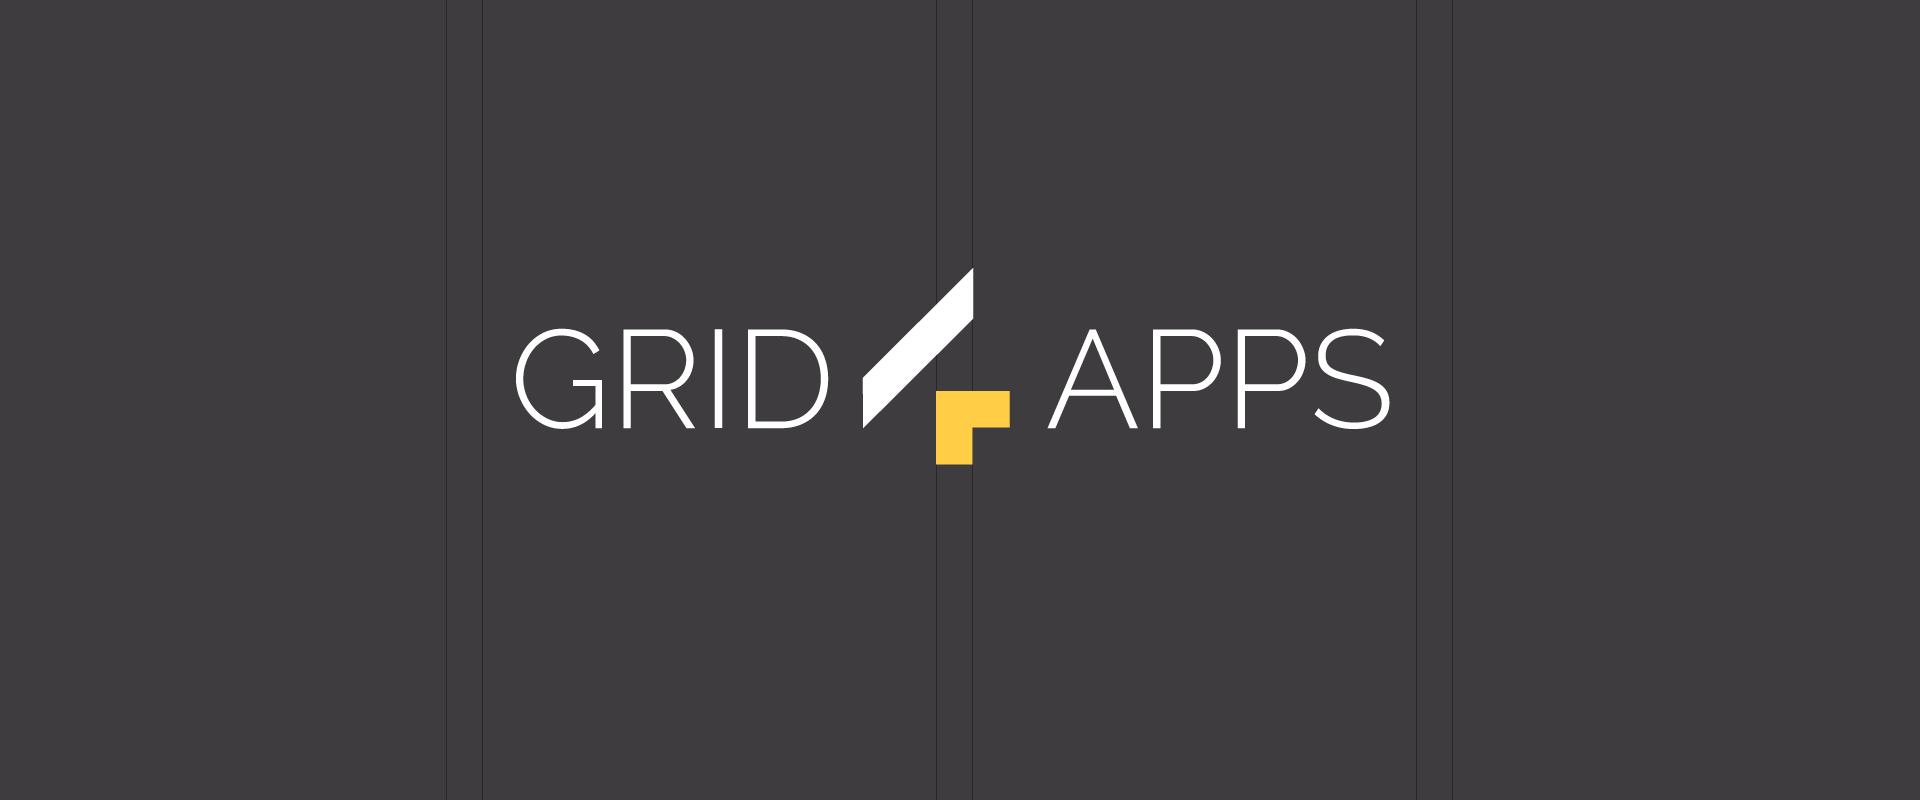 logo-grid4apps